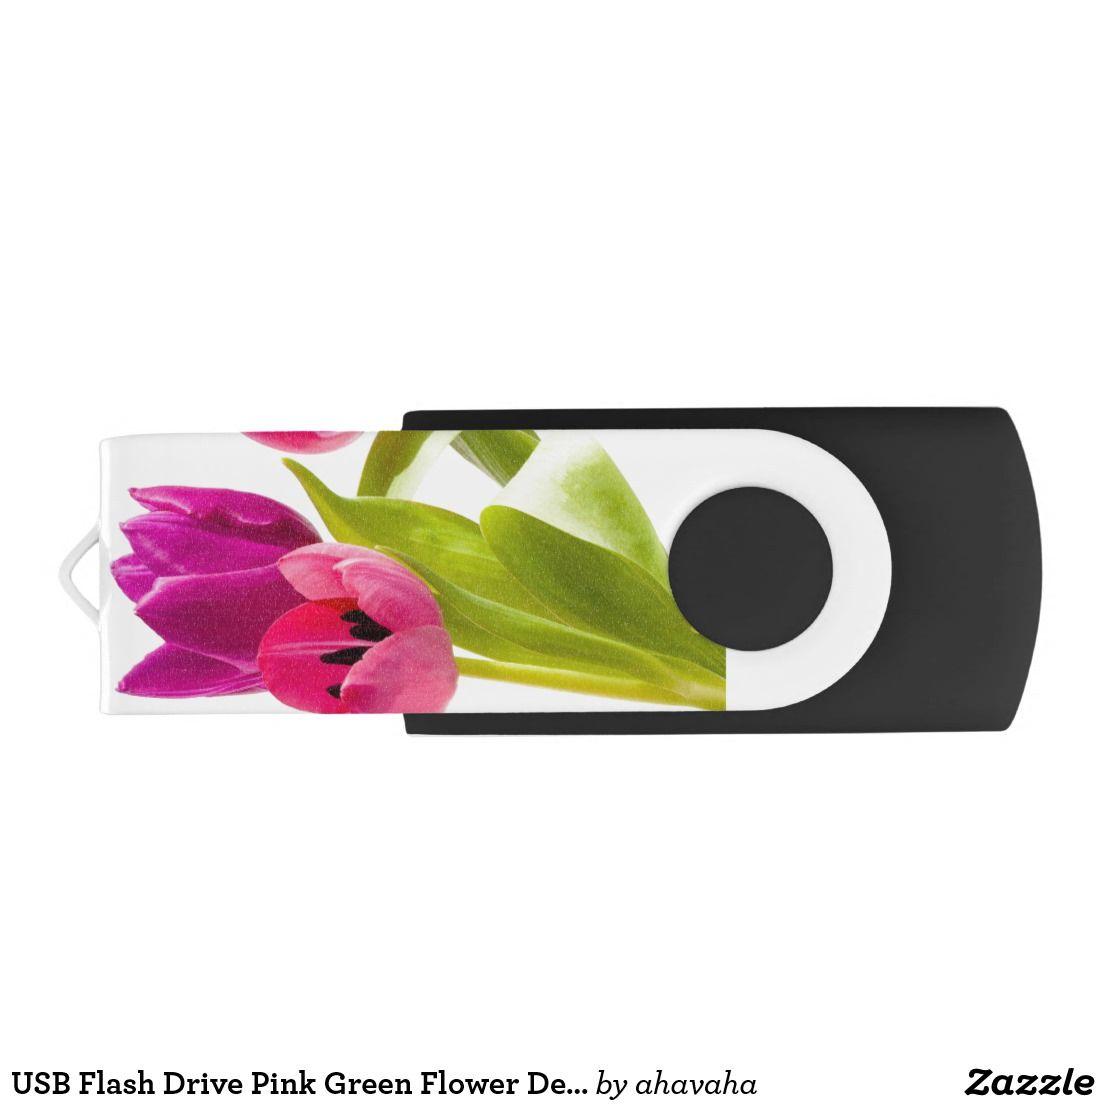 Usb Flash Drive Pink Green Flower Design Art Zazzle Com Green Flowers Design Art Flower Designs